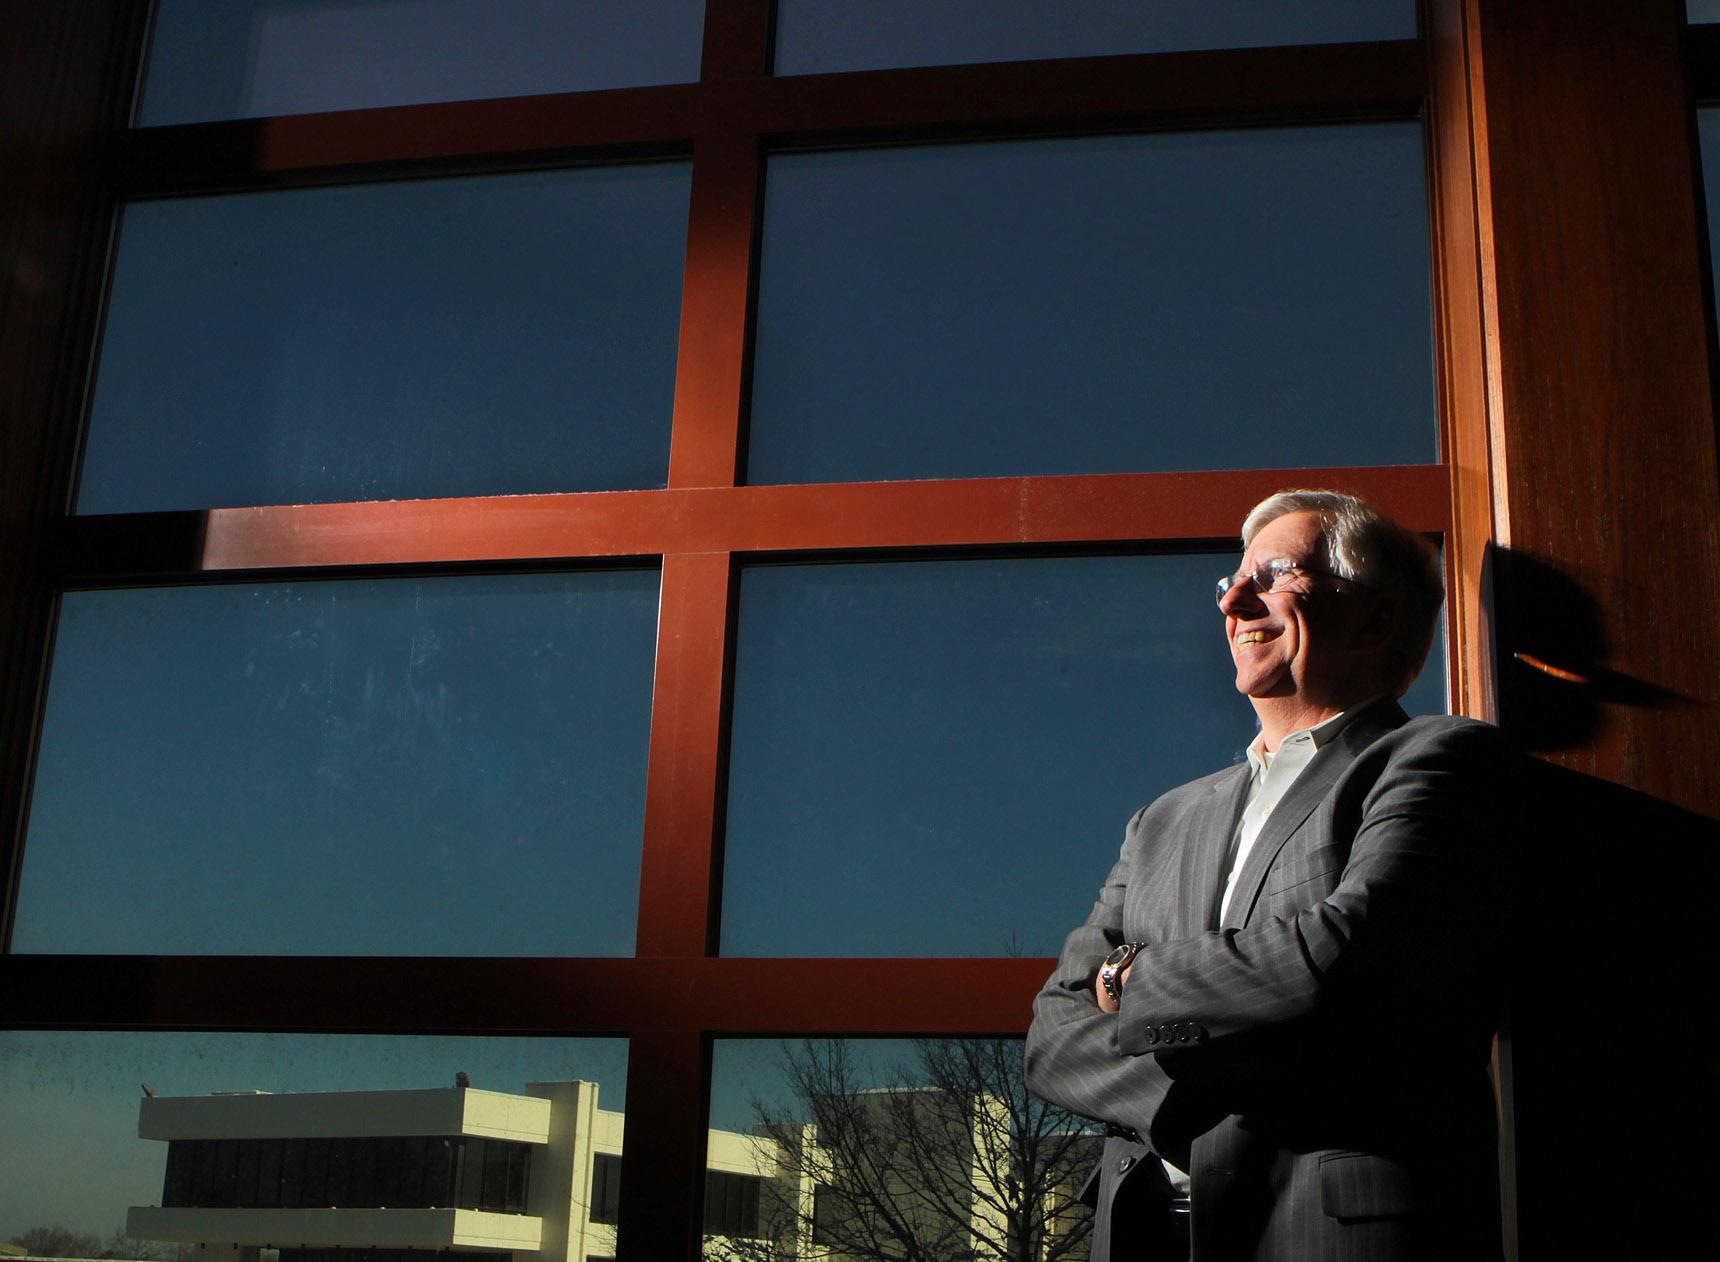 NJ CEO executive portrait